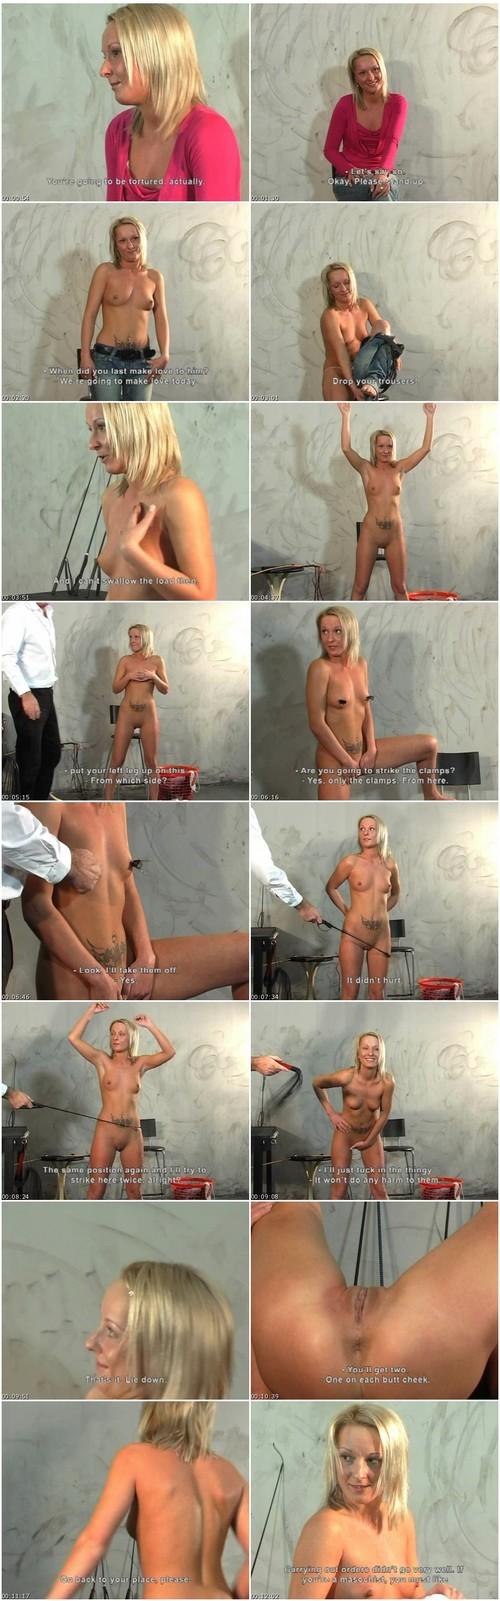 spankingVZ-x039_thumb_m.jpg